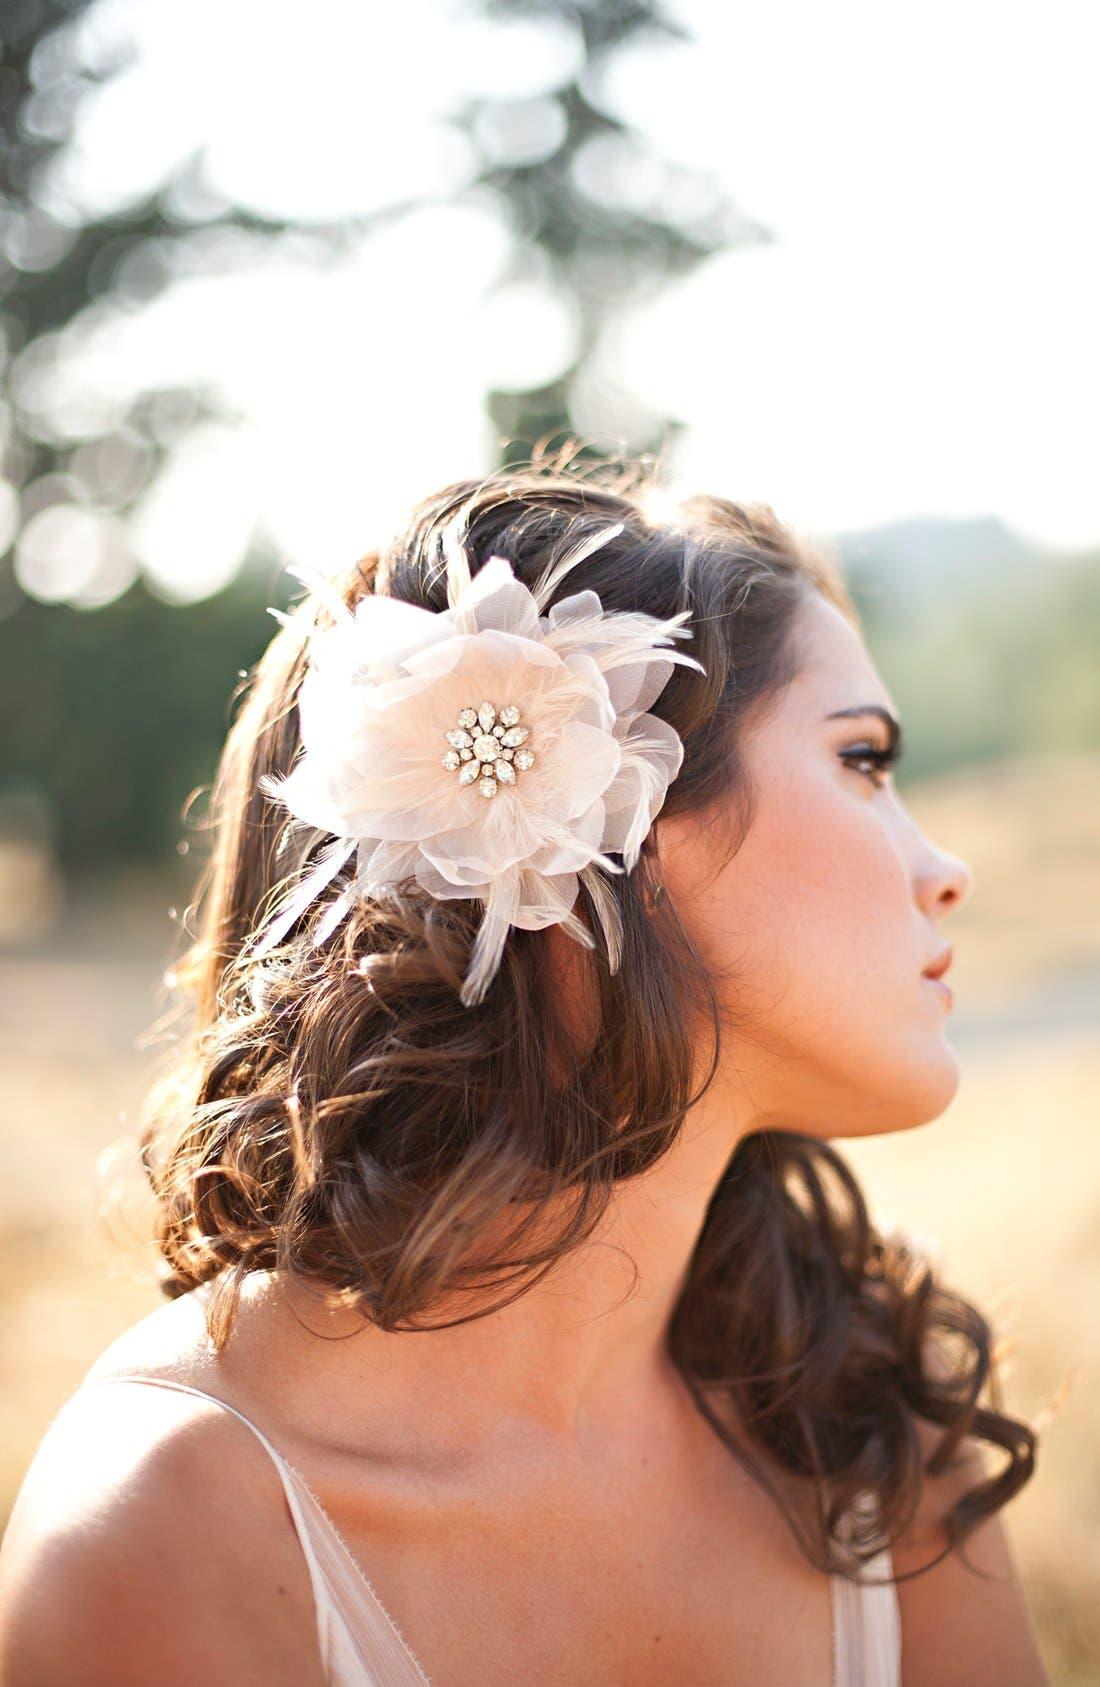 Alternate Image 2  - Serephine 'Renee' Bridal Hair Flower